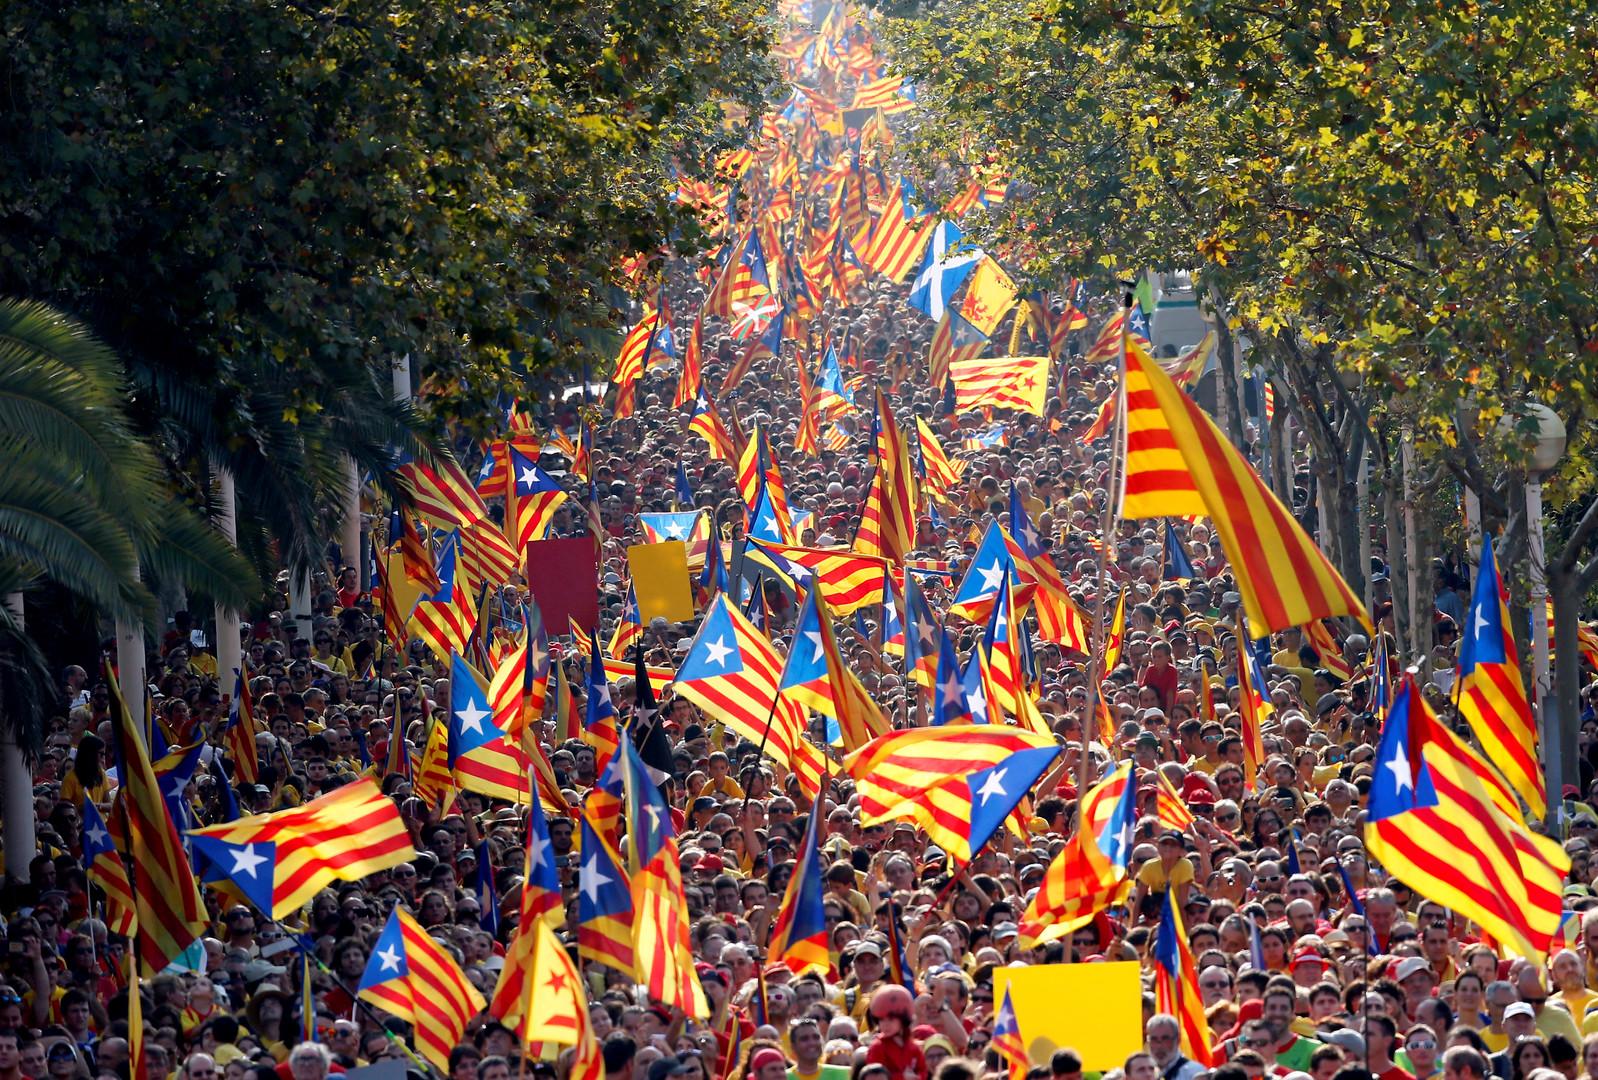 Katalonien: Bürger der künftigen Republik bekommen neue Personalausweise